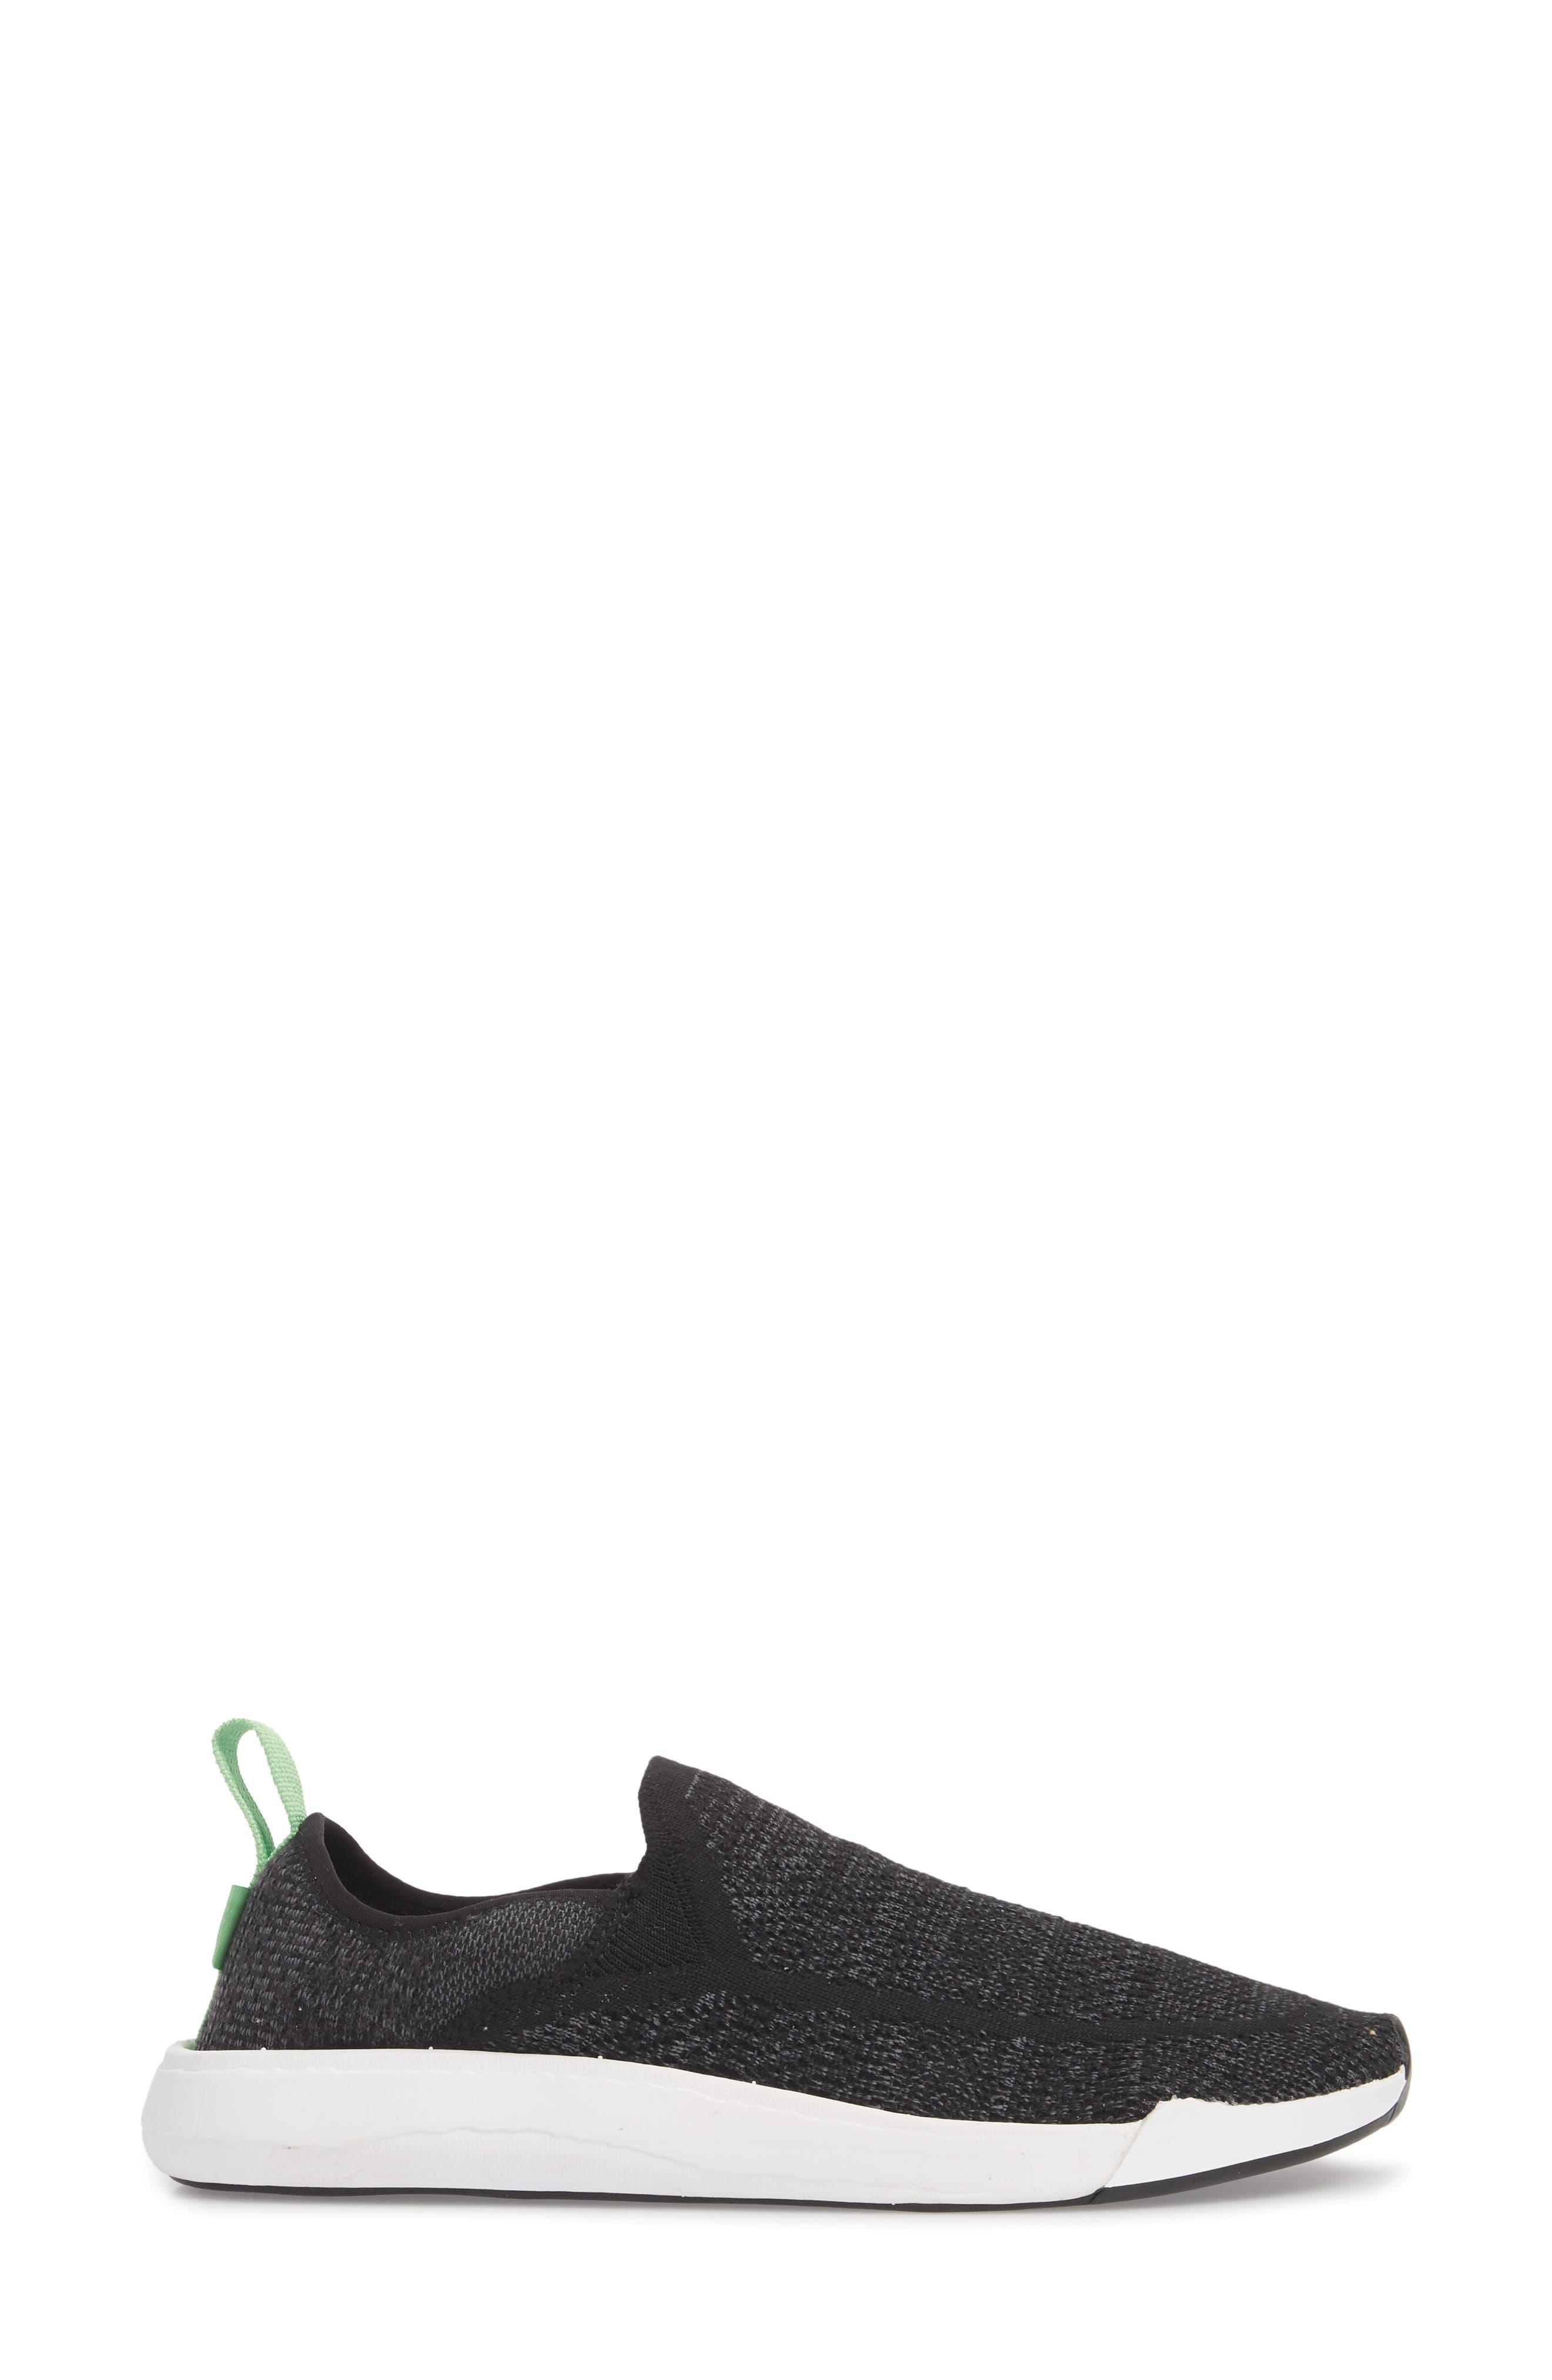 SANUK, Chiba Quest Knit Slip-On Sneaker, Alternate thumbnail 3, color, BLACK